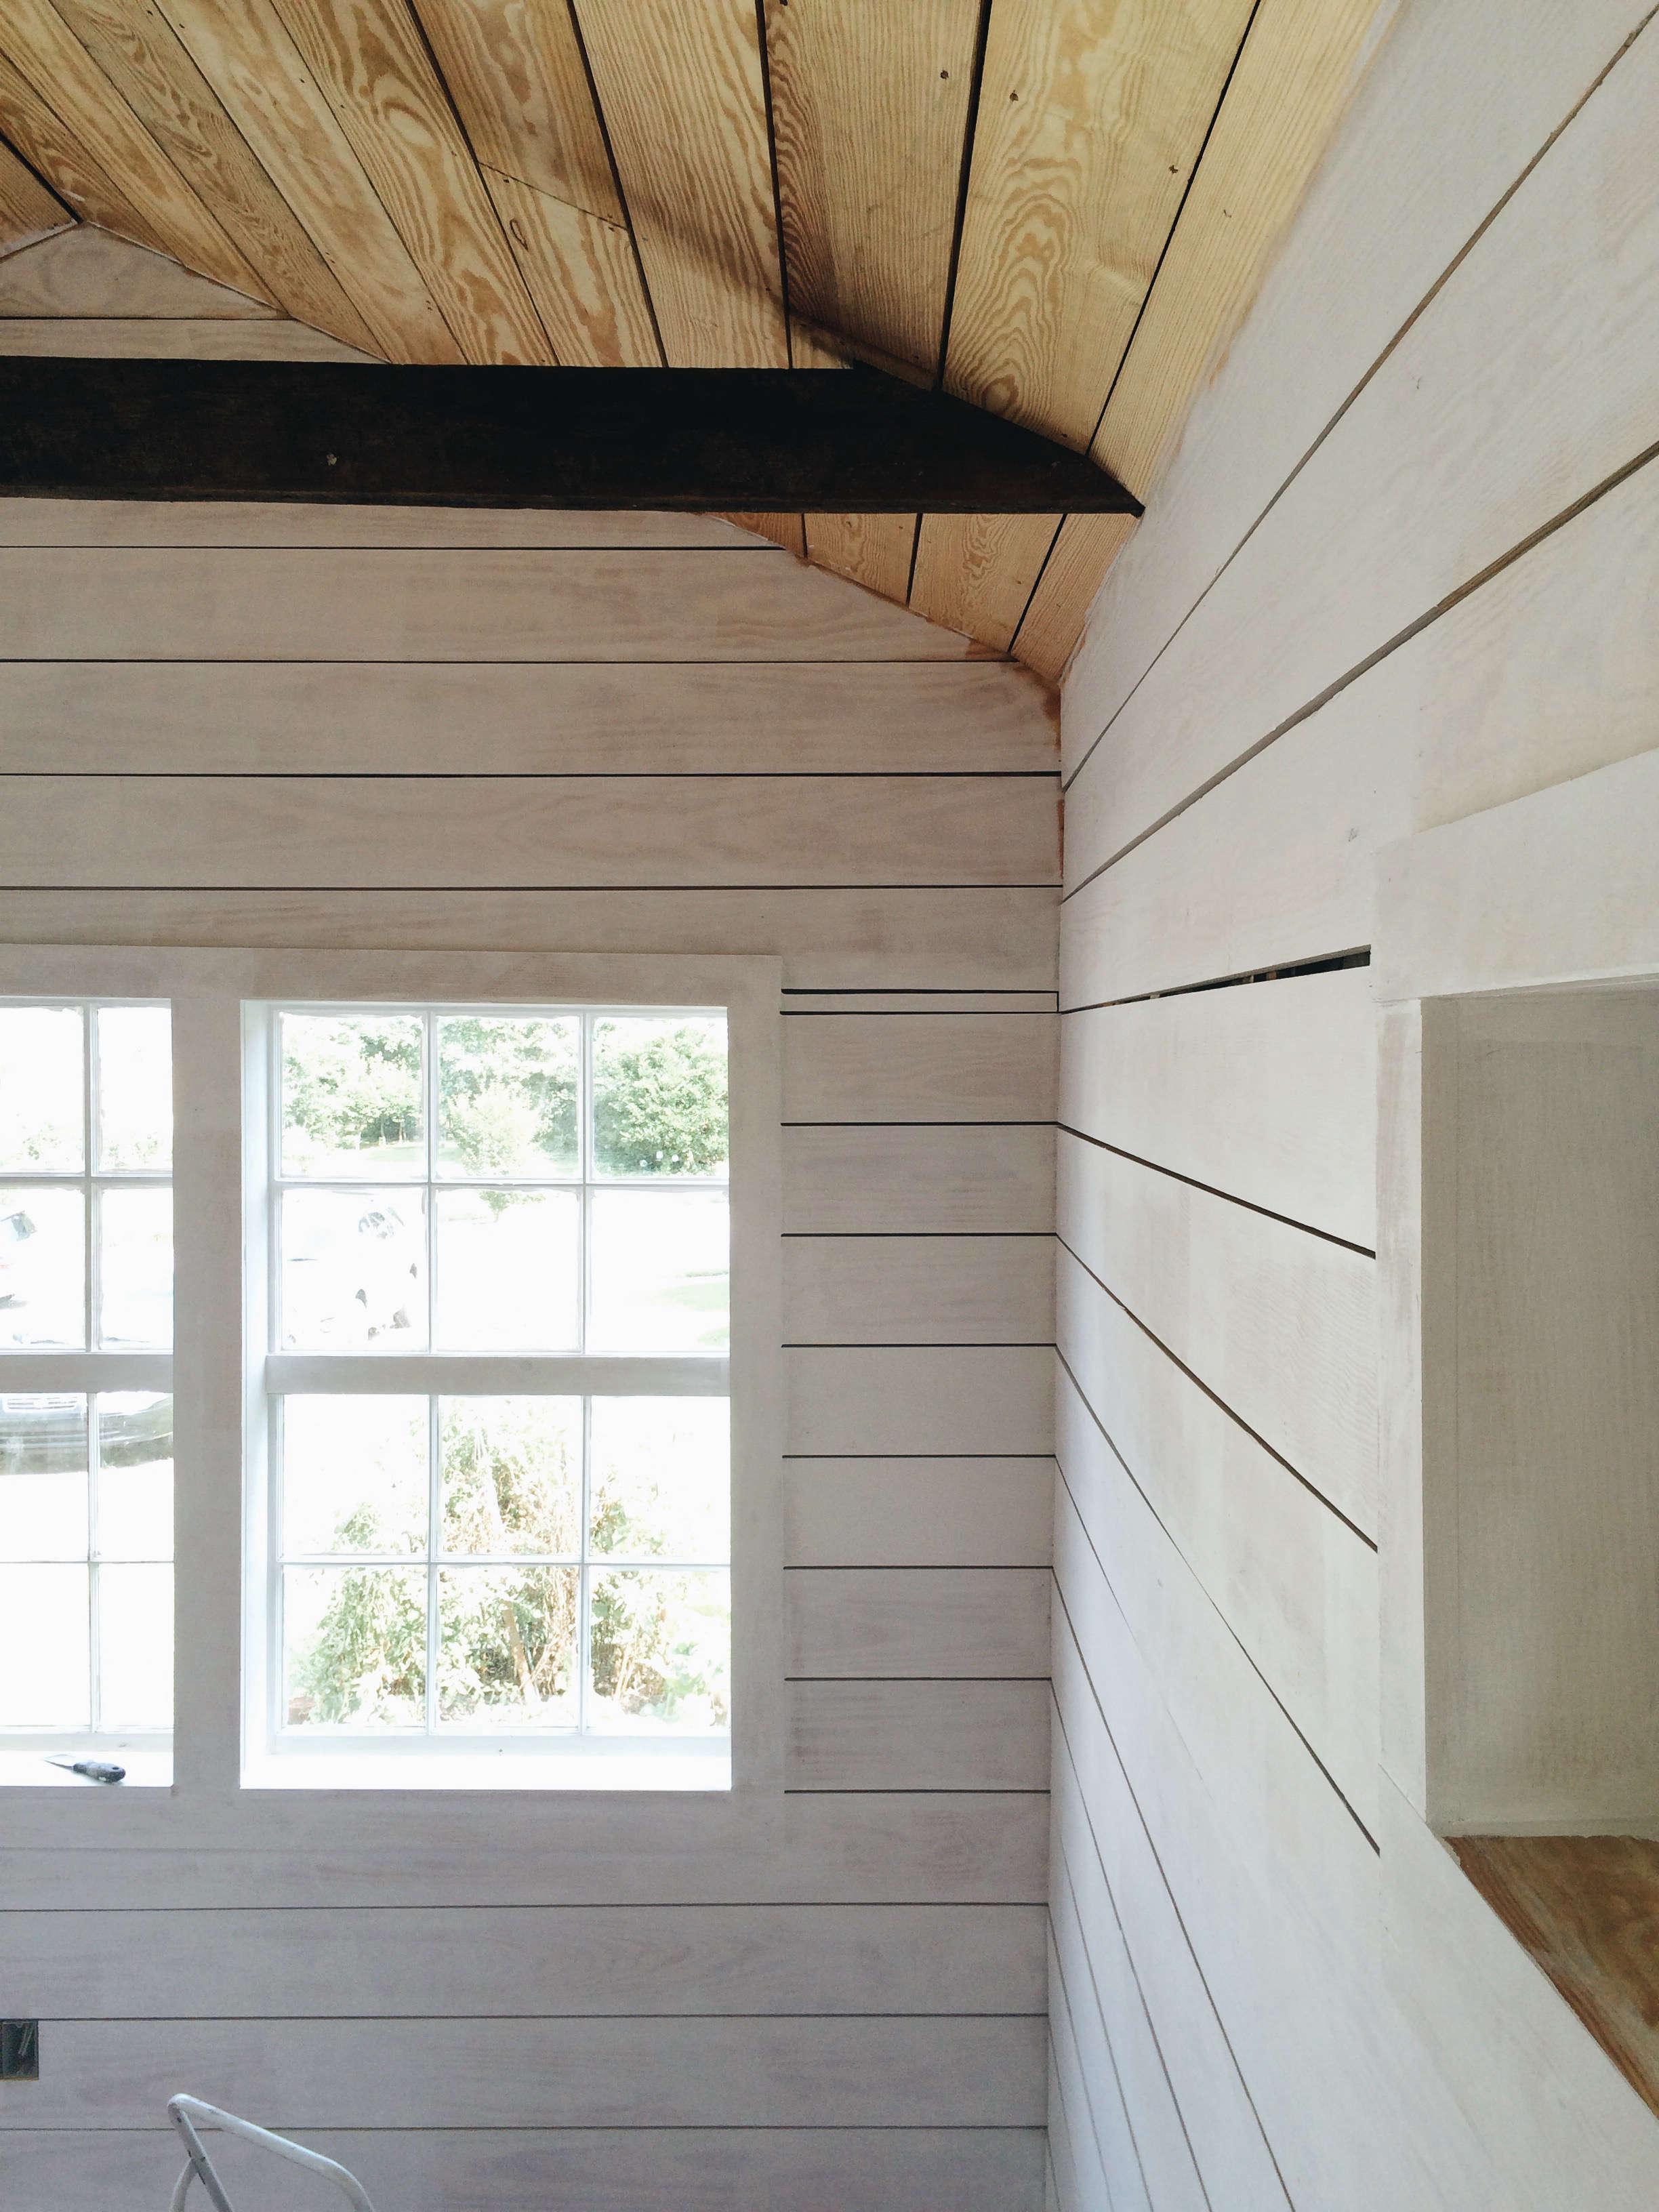 Good South Studio Interior Paint, Photo by Chris and Elizabeth Boyette